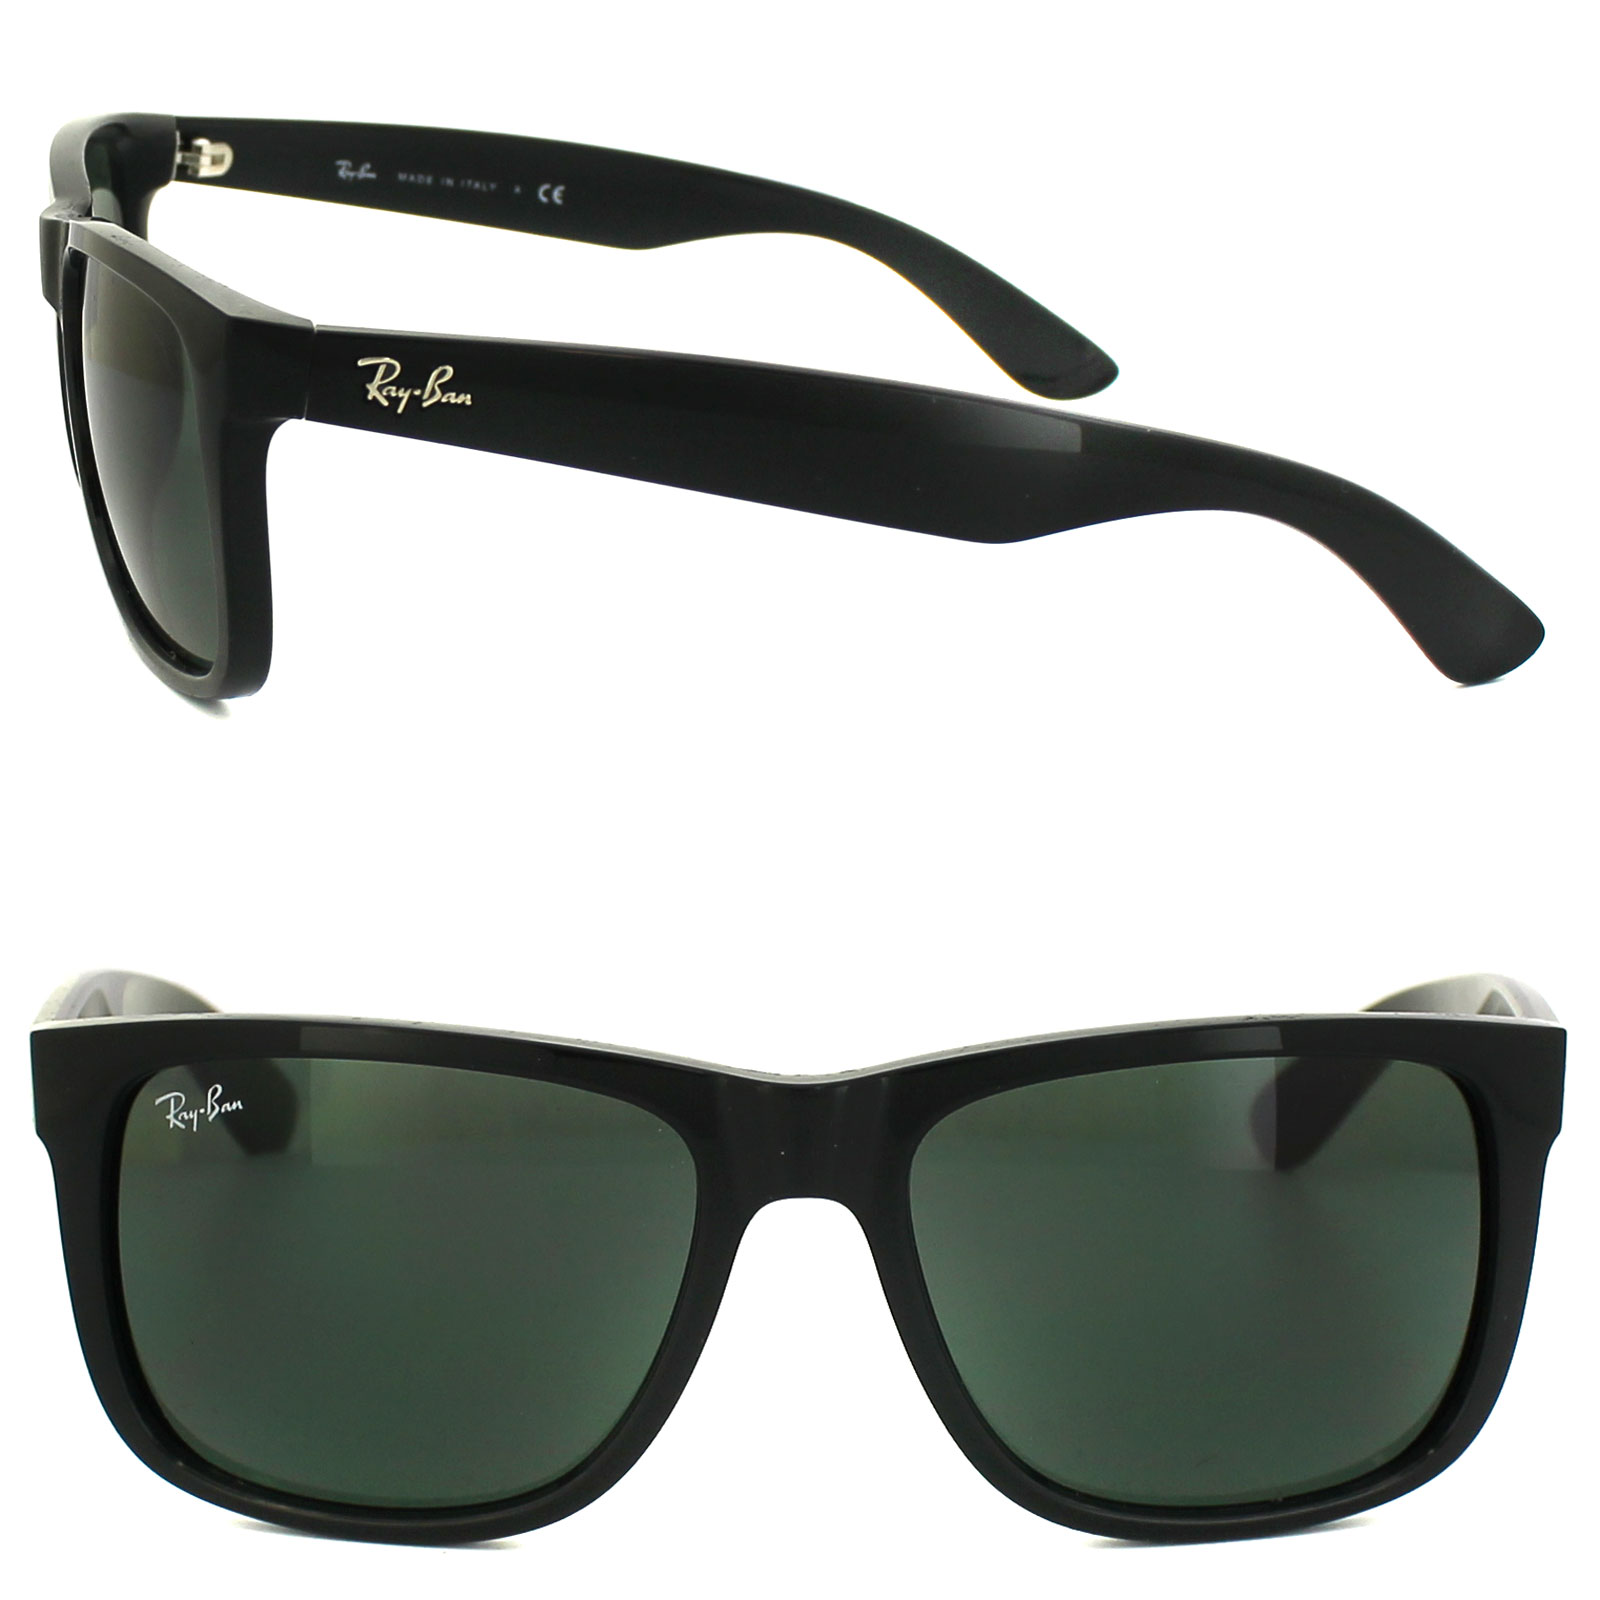 274ed51f2b Sentinel Ray-Ban Sunglasses Justin 4165 601 71 Shiny Black Green Large 55mm